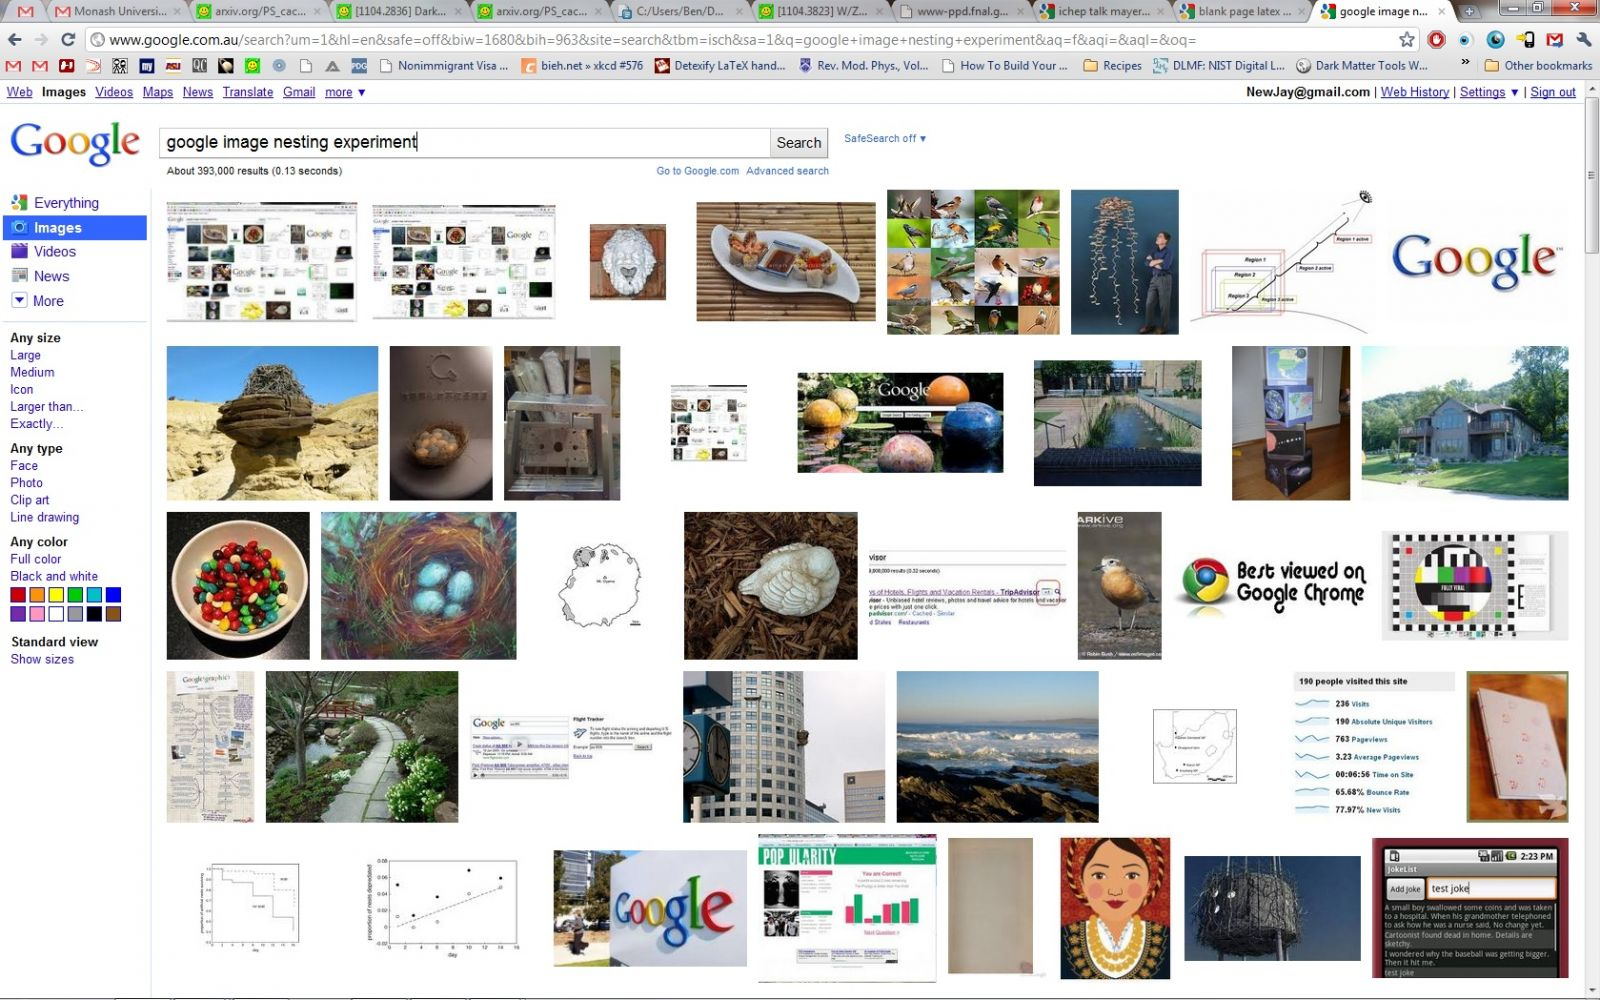 google image nesting experiment #2